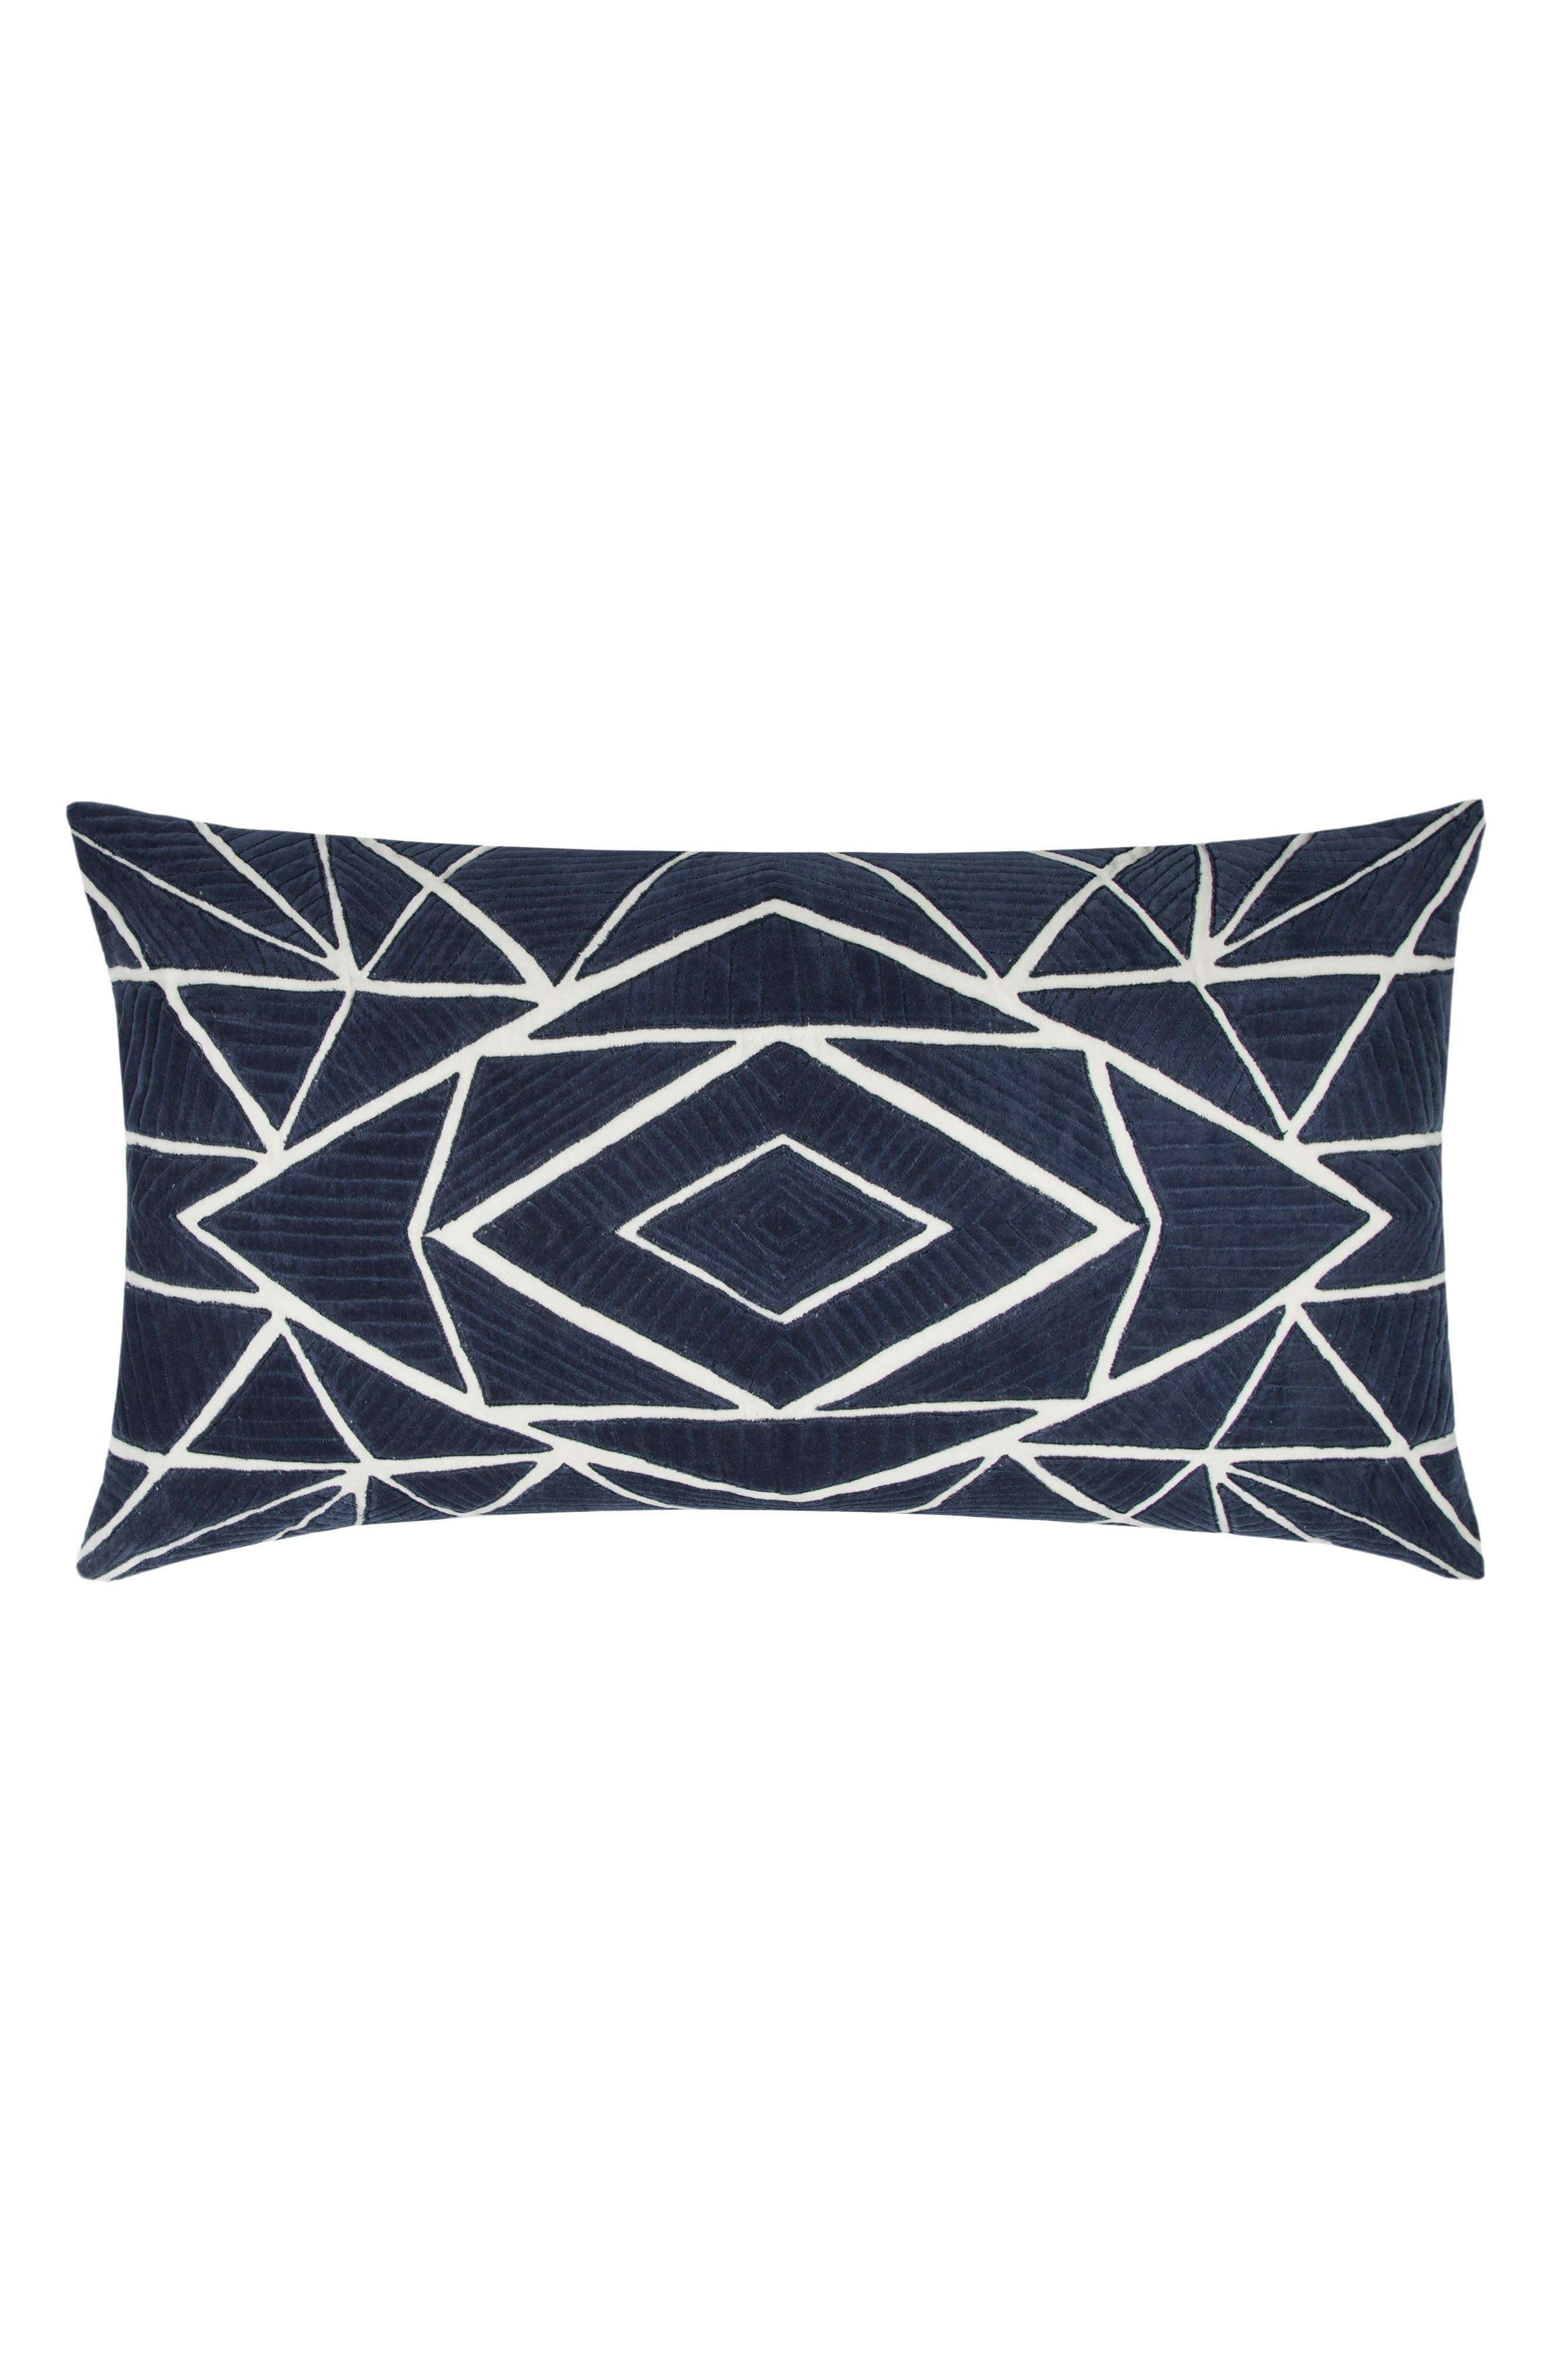 Geometric Accent Pillow,                             Main thumbnail 1, color,                             Indigo